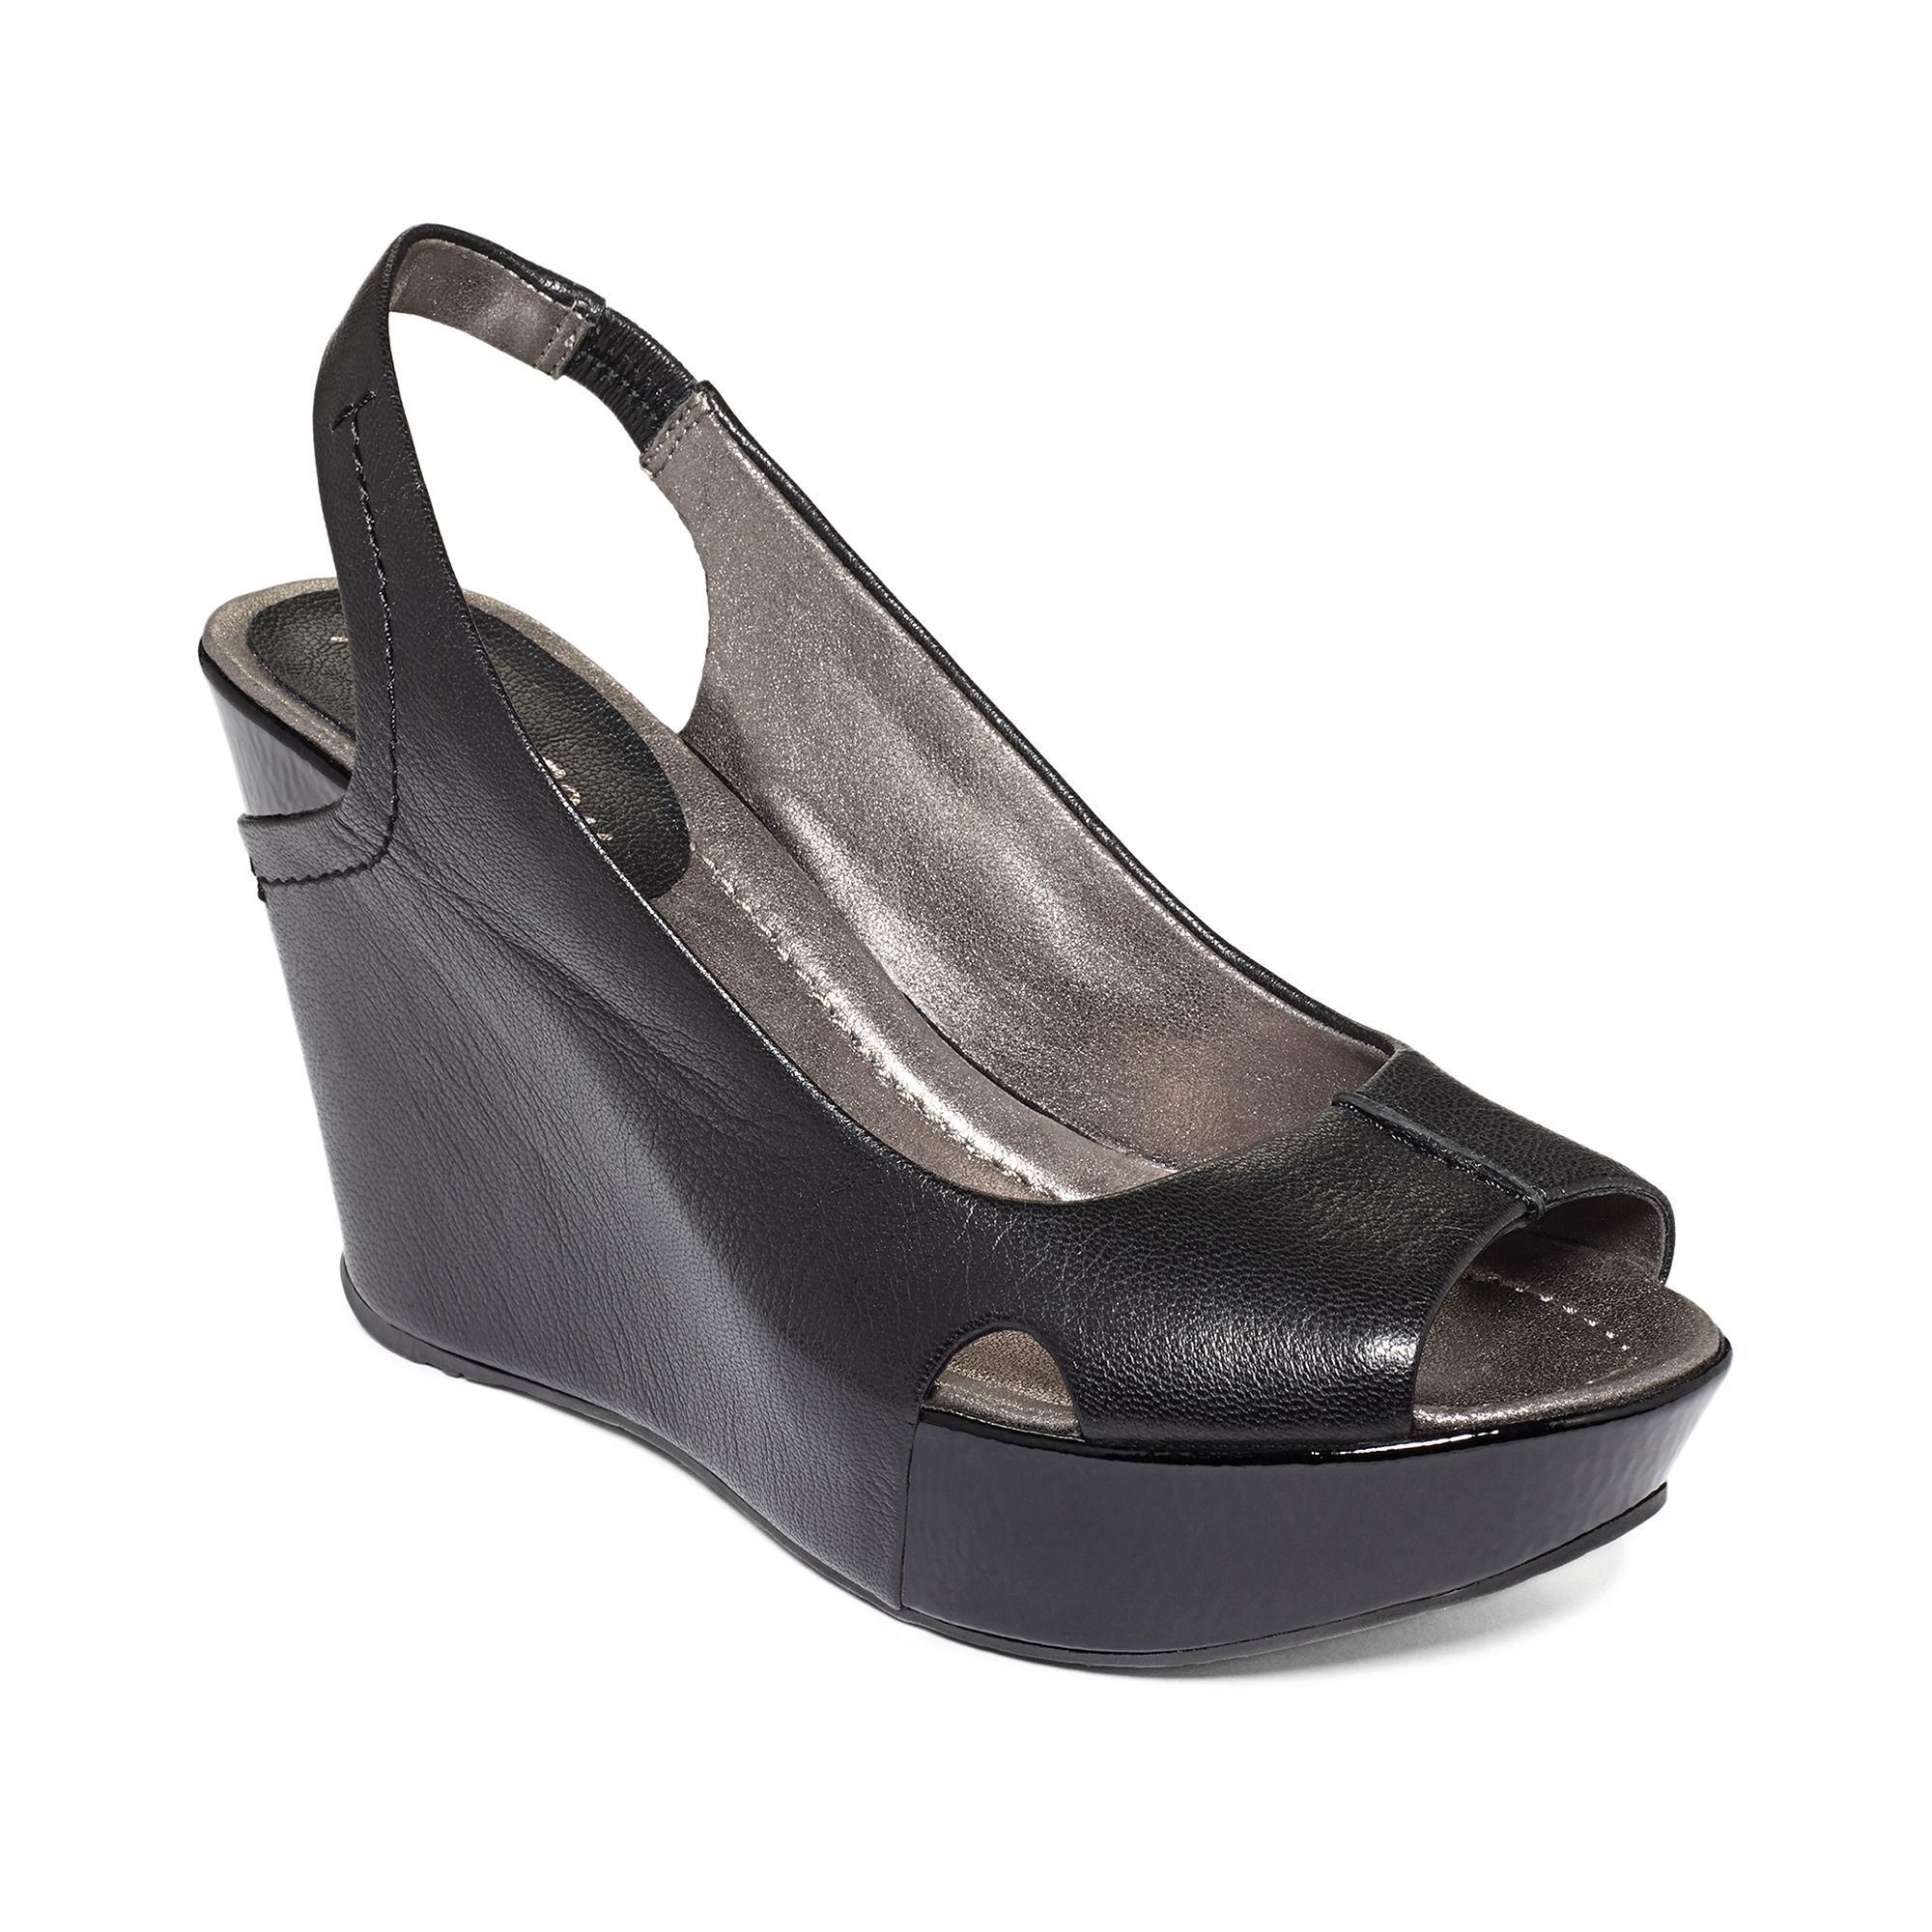 Kenneth Cole Reaction Sole Envy Platform Wedge Sandals In